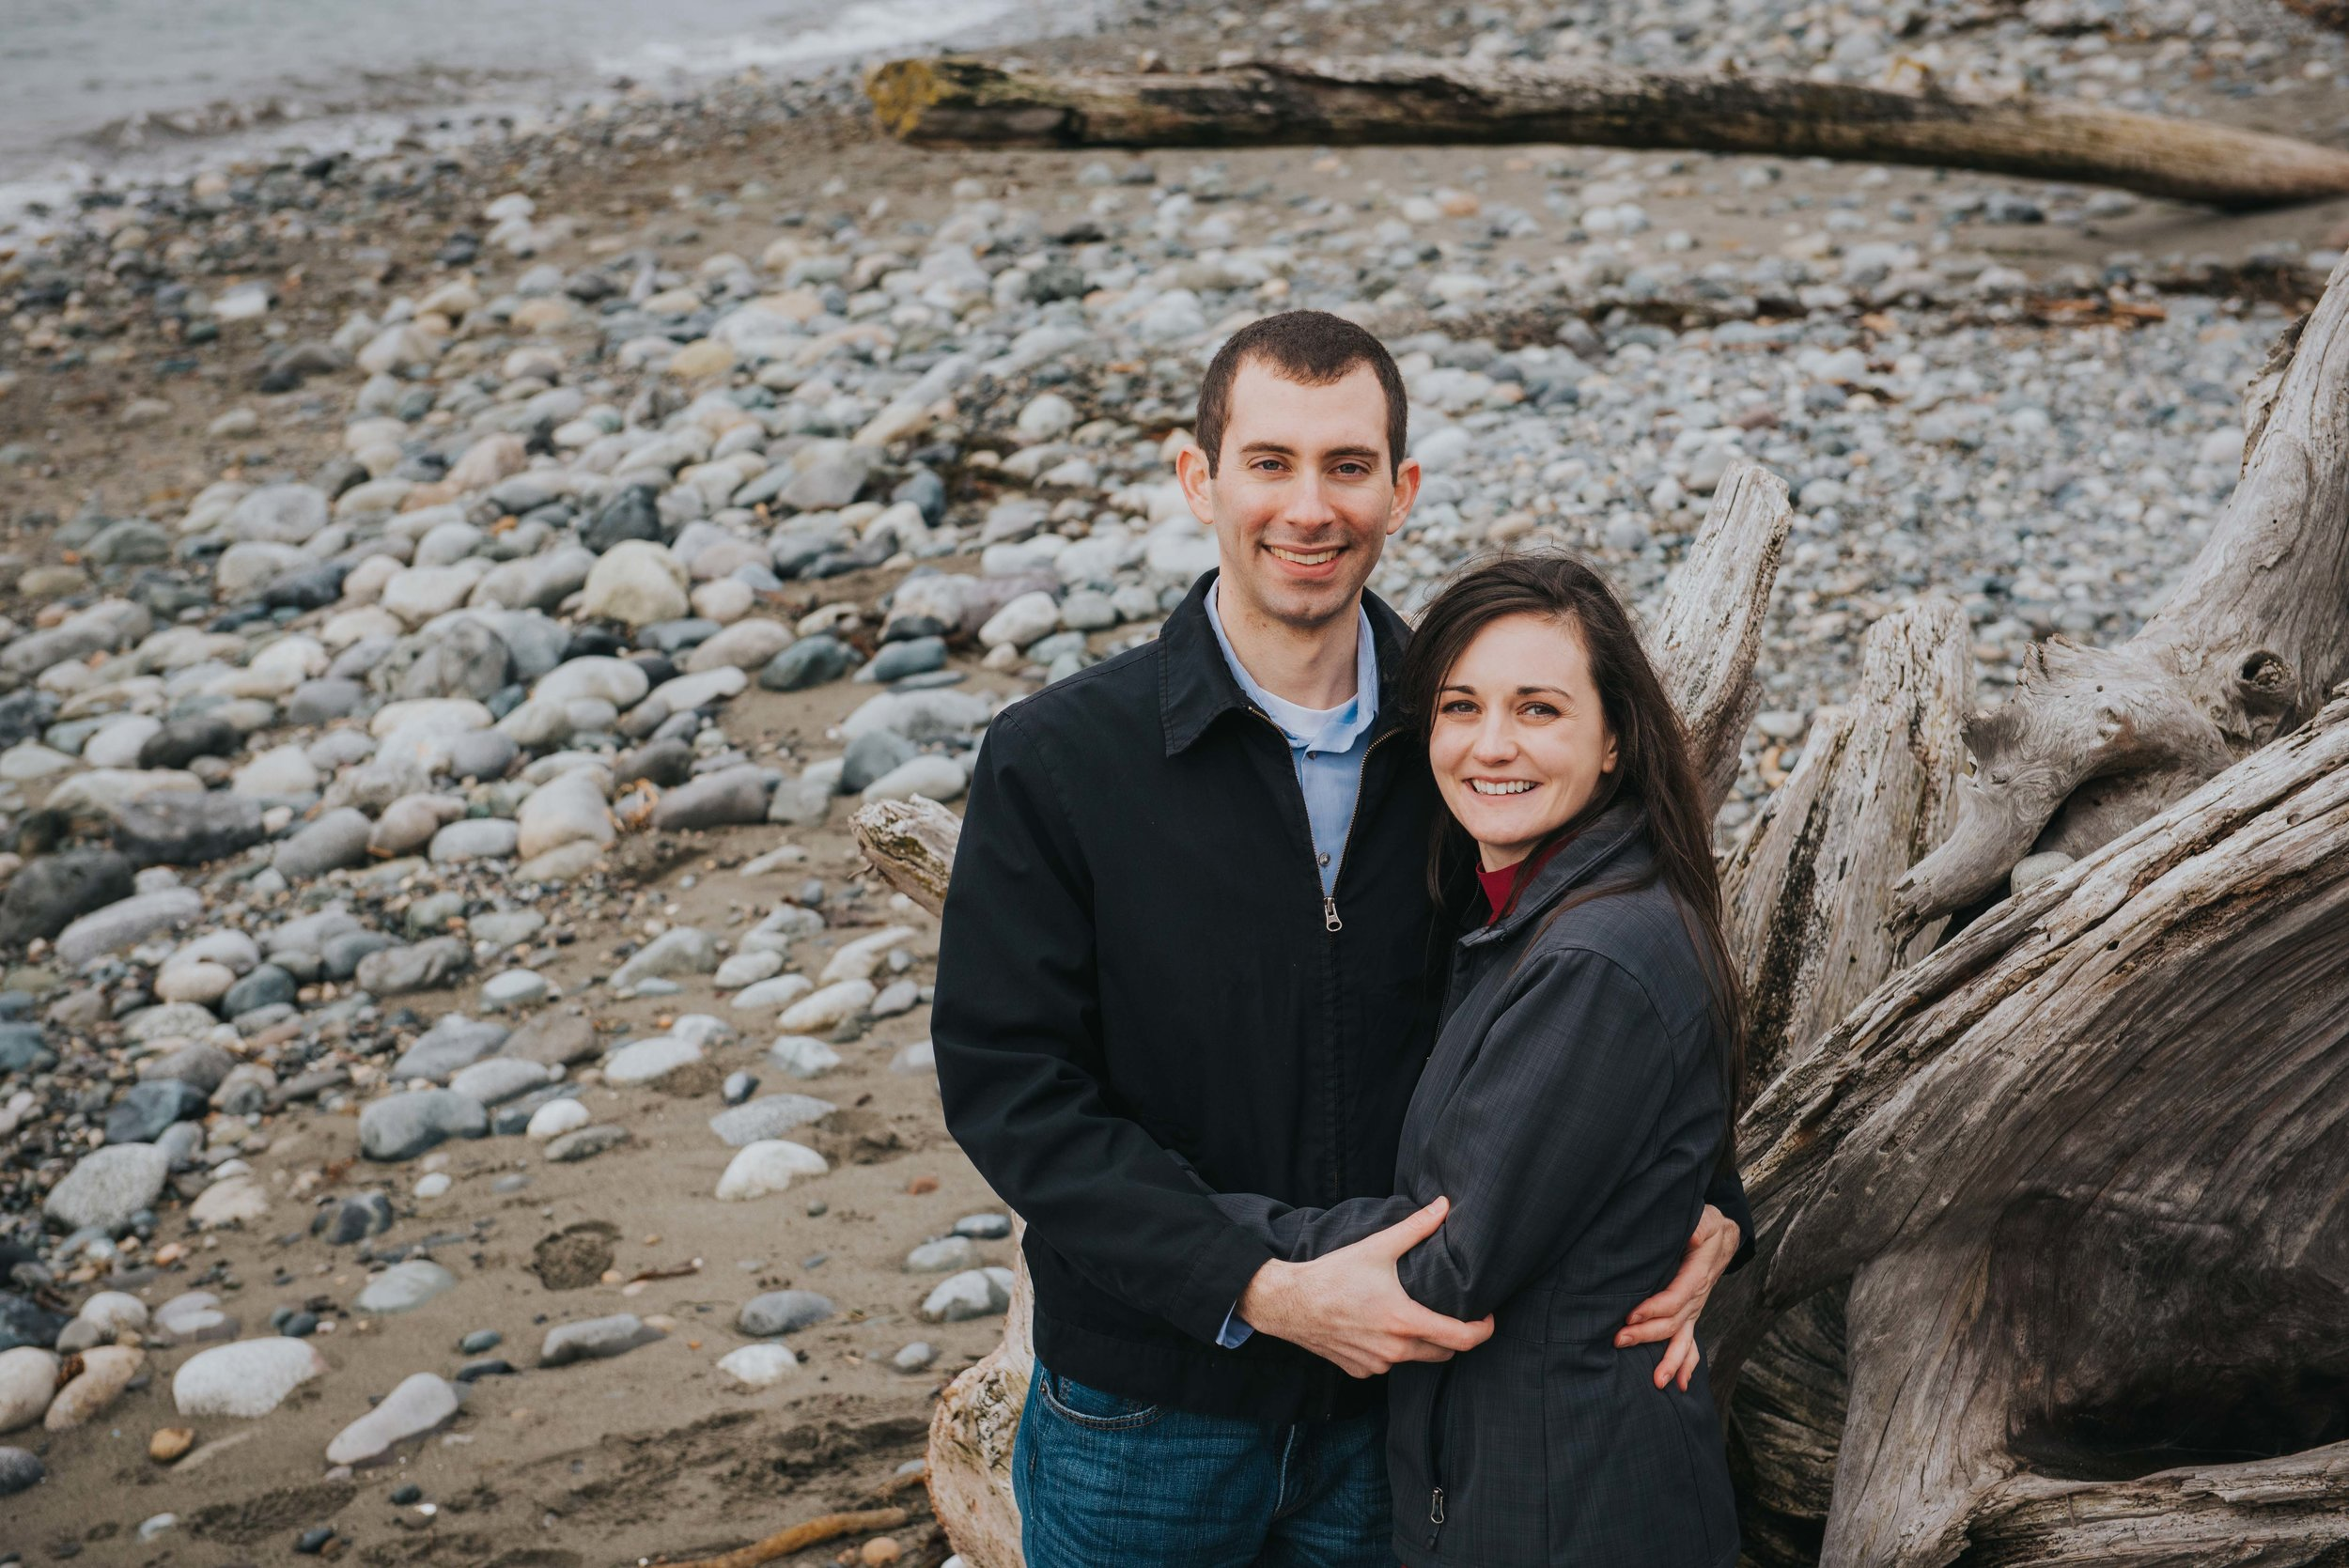 Oak-Harbor-Wedding-Photographer-J-Hodges (25 of 34).jpg